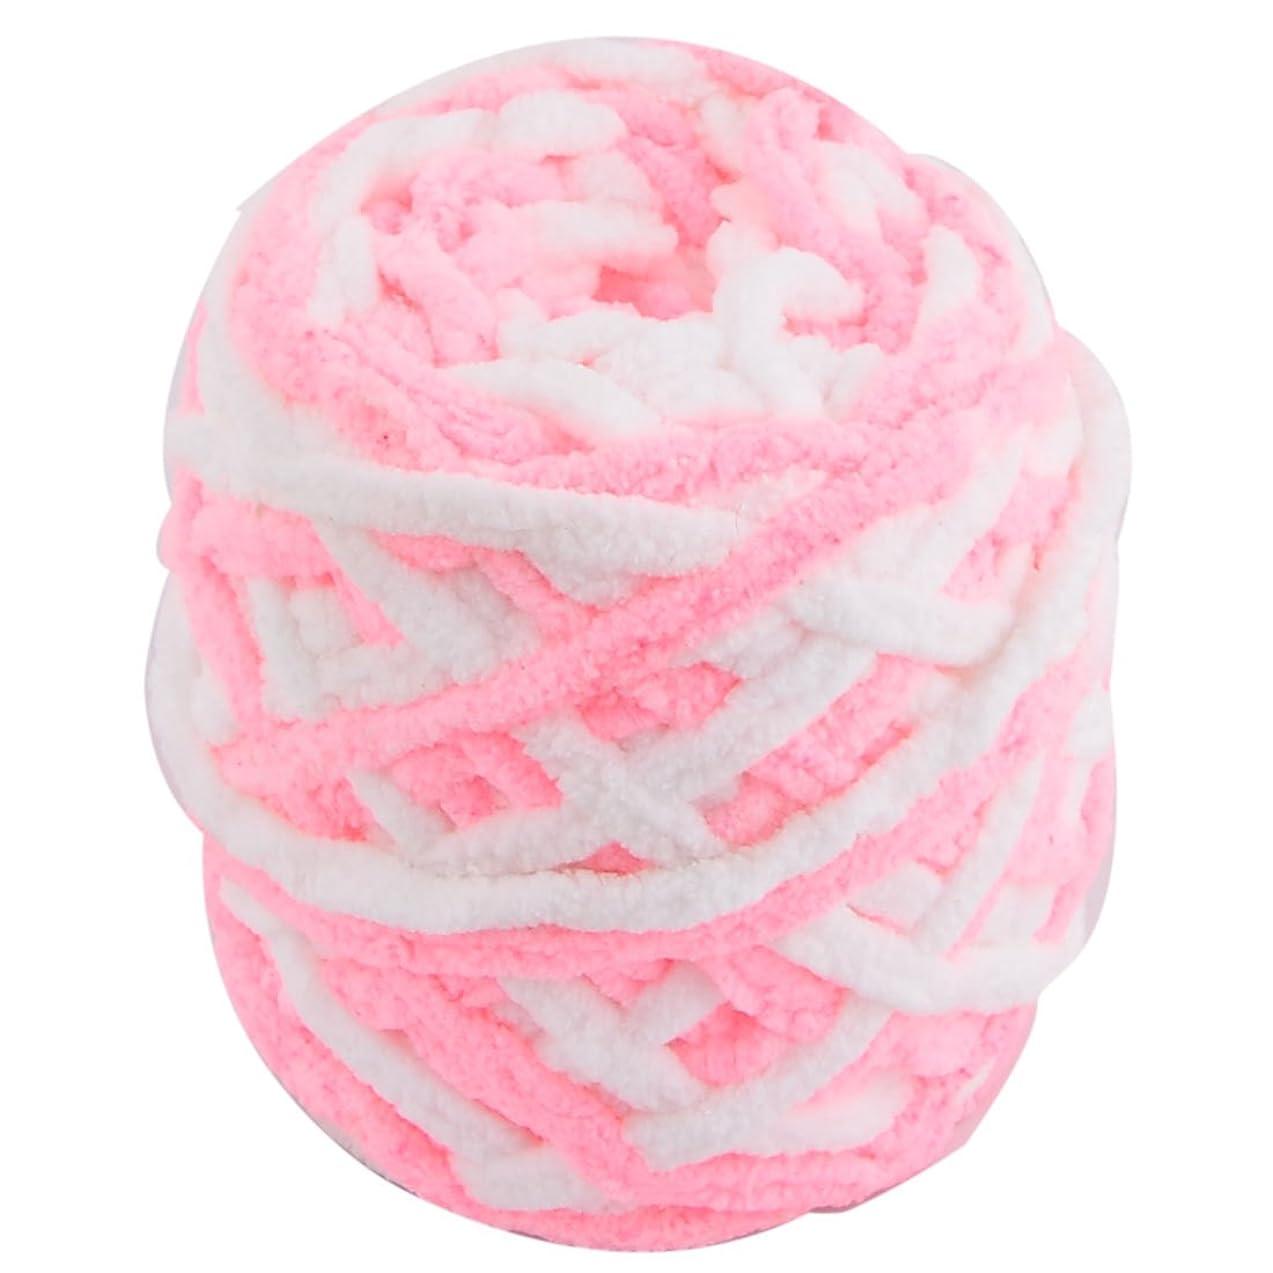 uxcell Polyester Home Festival Knitting Handicraft DIY Hat Blanket Scarf Yarn 100g White Pink